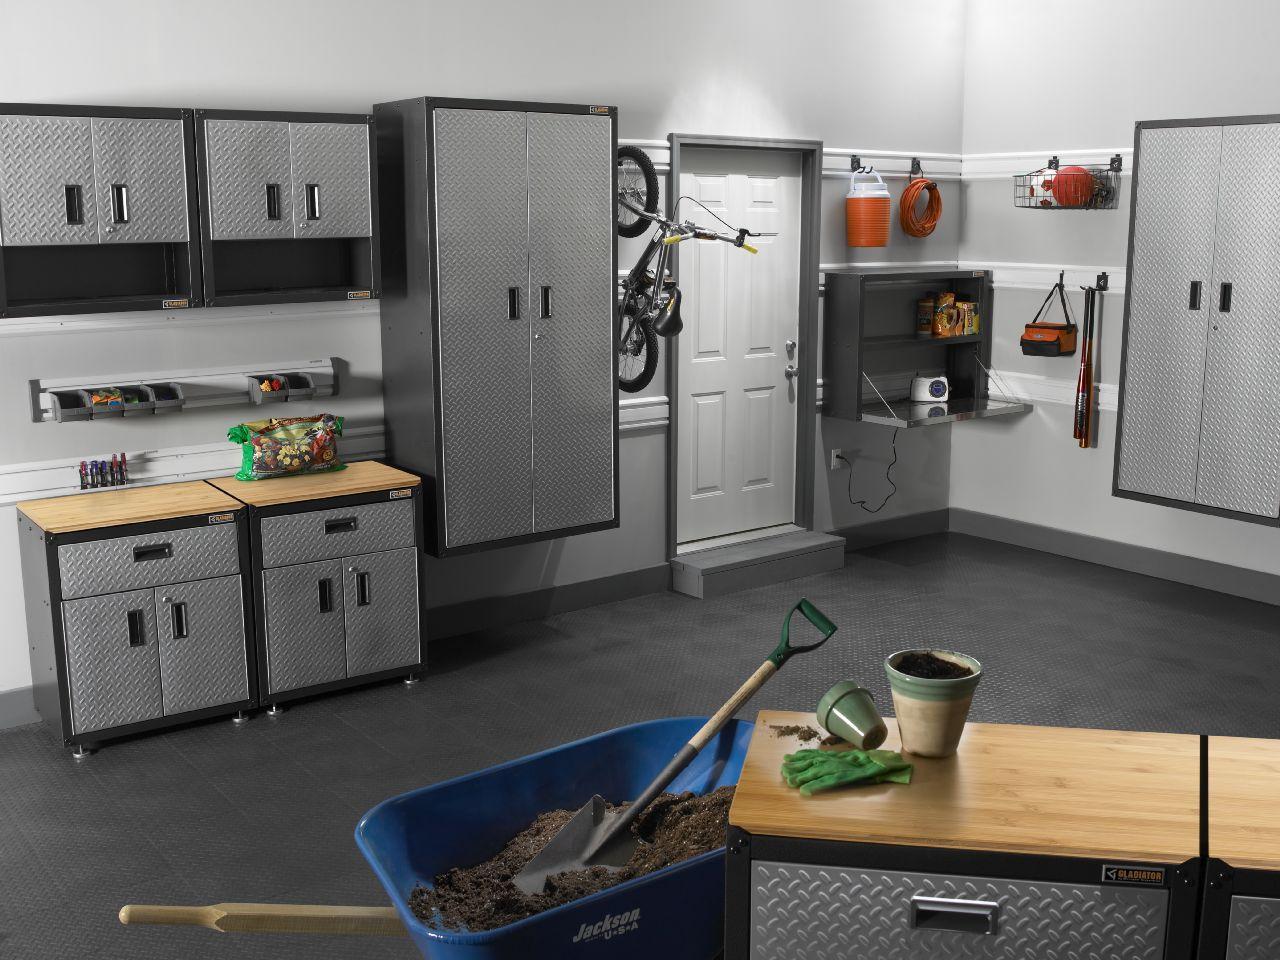 Gladiator Garage Storage Cabinets: Amazon.com: Gladiator GAWG28KDYG 3/4 Door EZ RTA Wall